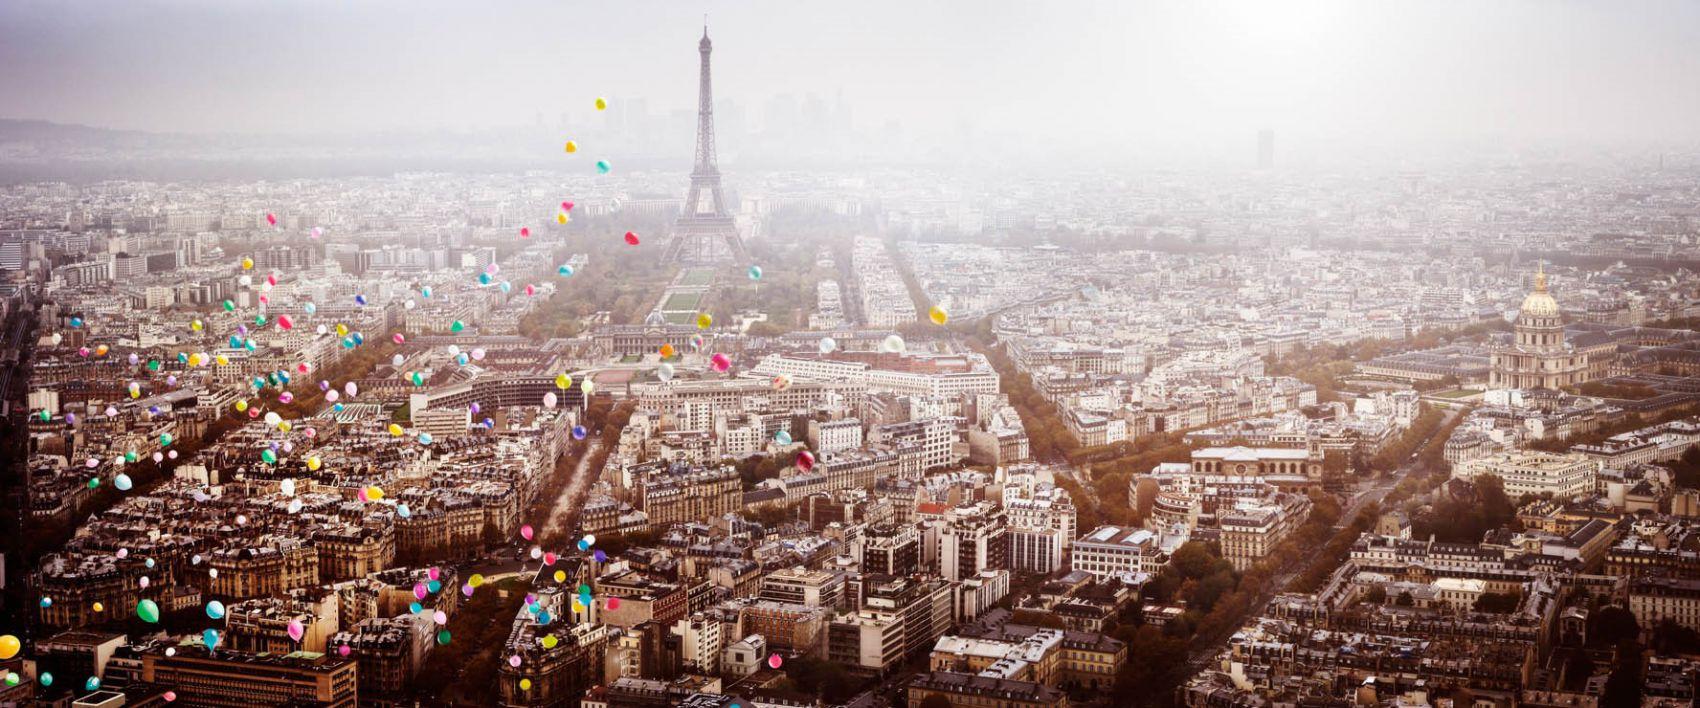 David Drebin, Balloons Over Paris